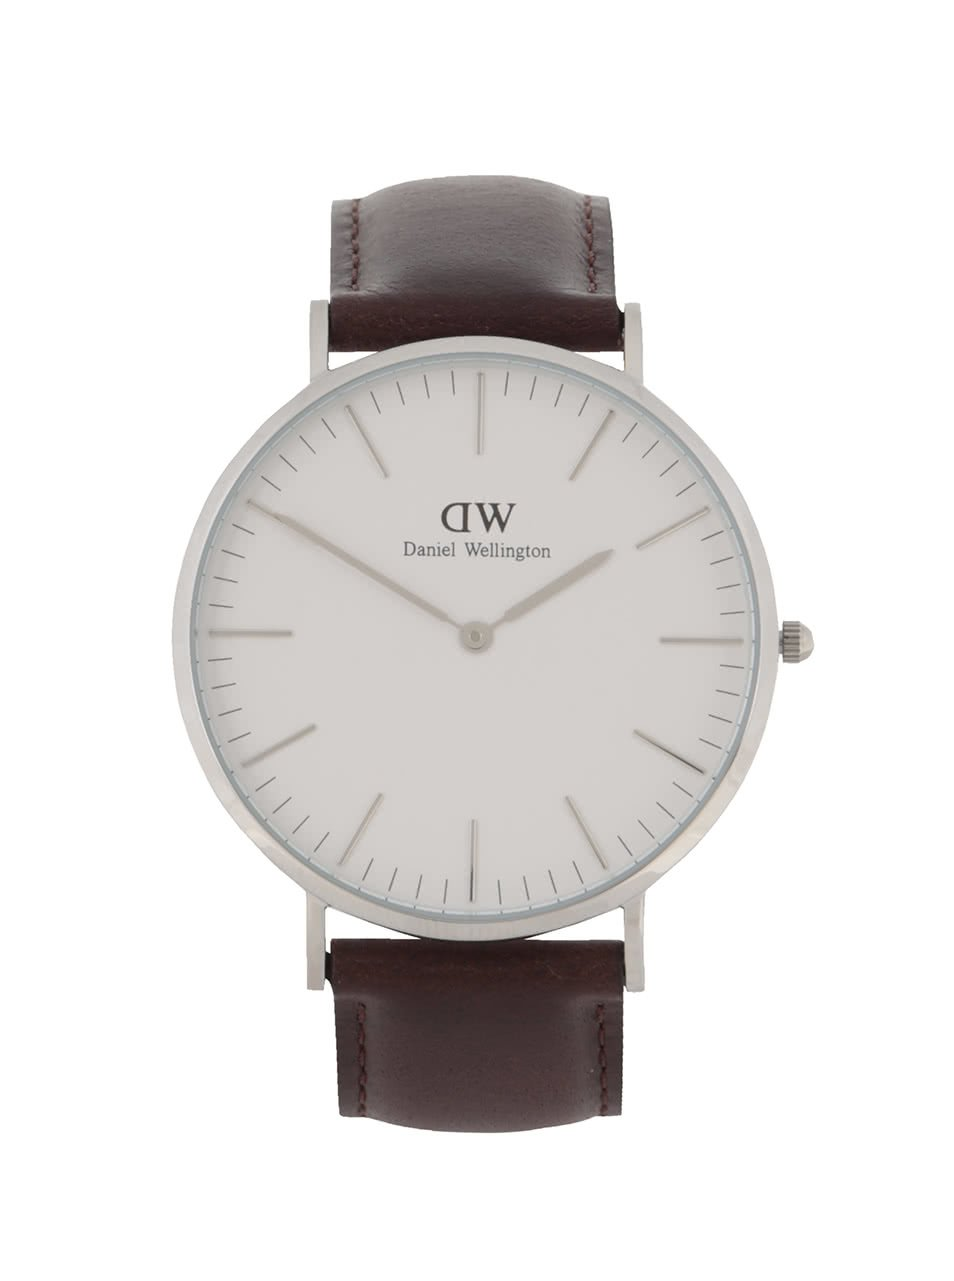 P�nsk� hodinky ve st?�brn� barv? CLASSIC Bristol Daniel Wellington